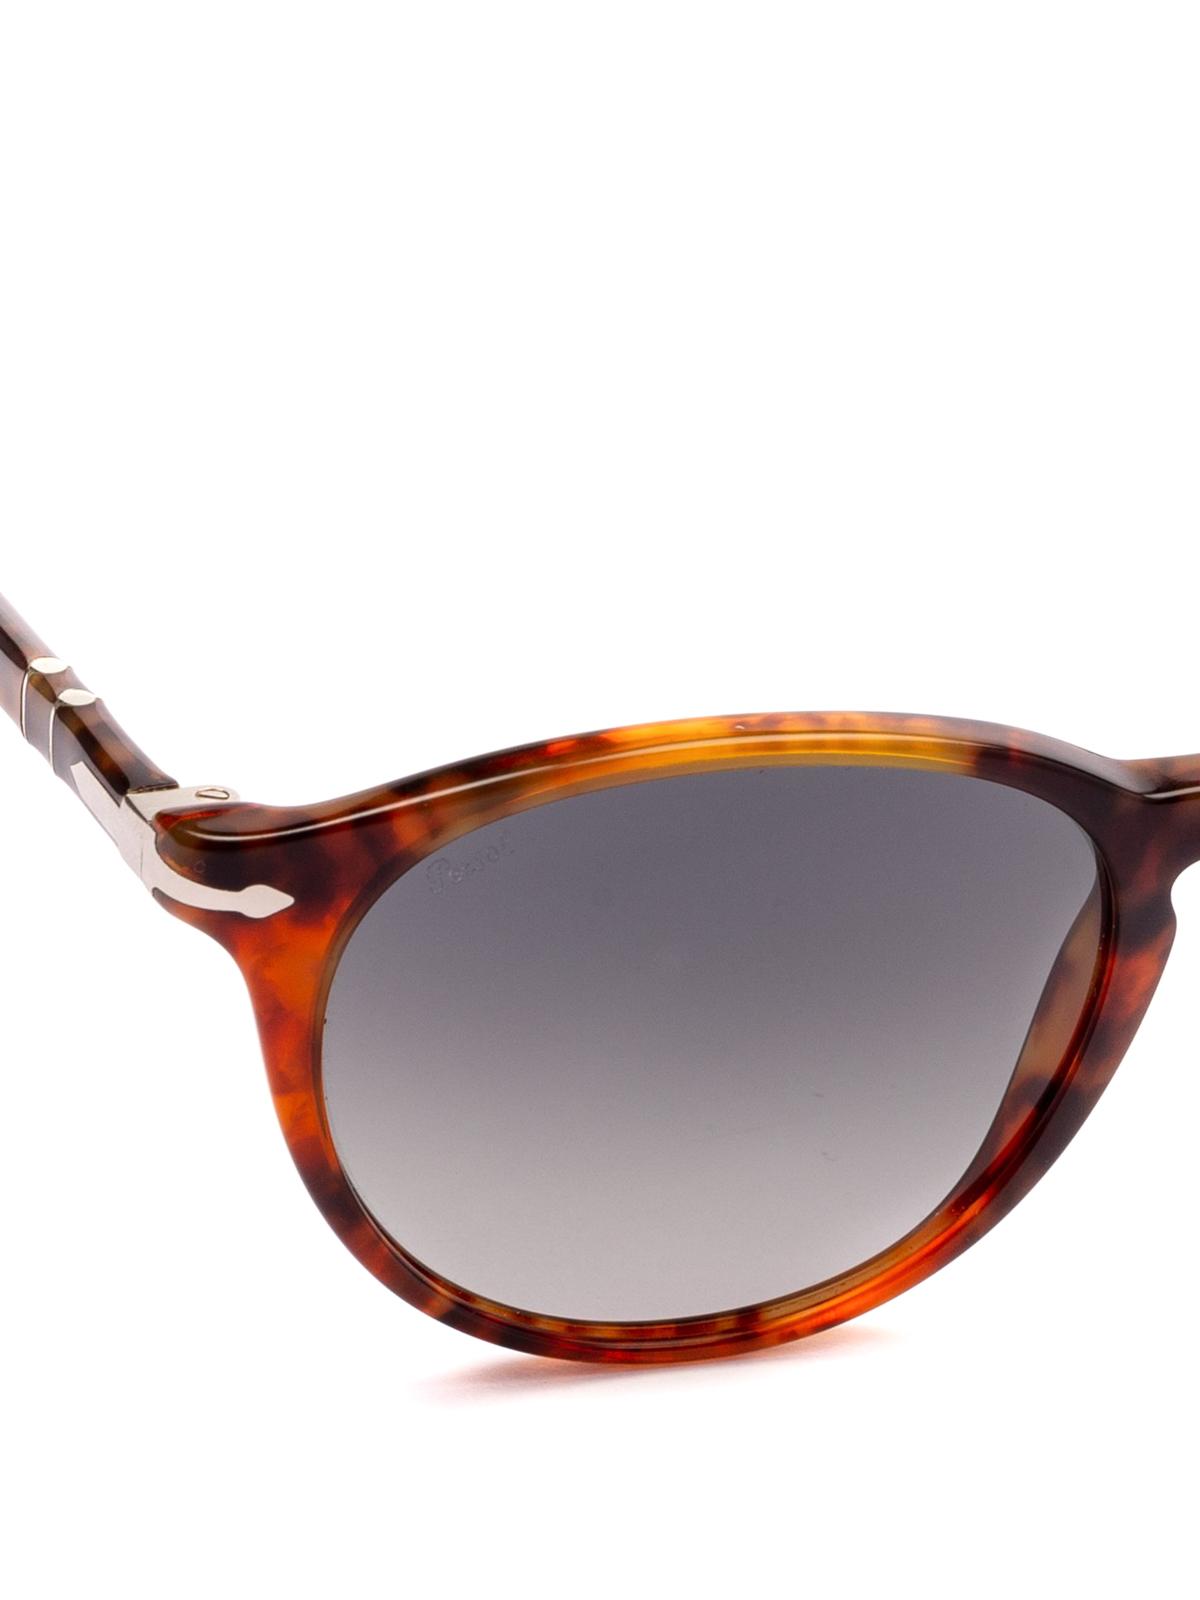 9fe6797b01 iKRIX PERSOL  sunglasses - Tortoise frame oval dark lens sunglasses